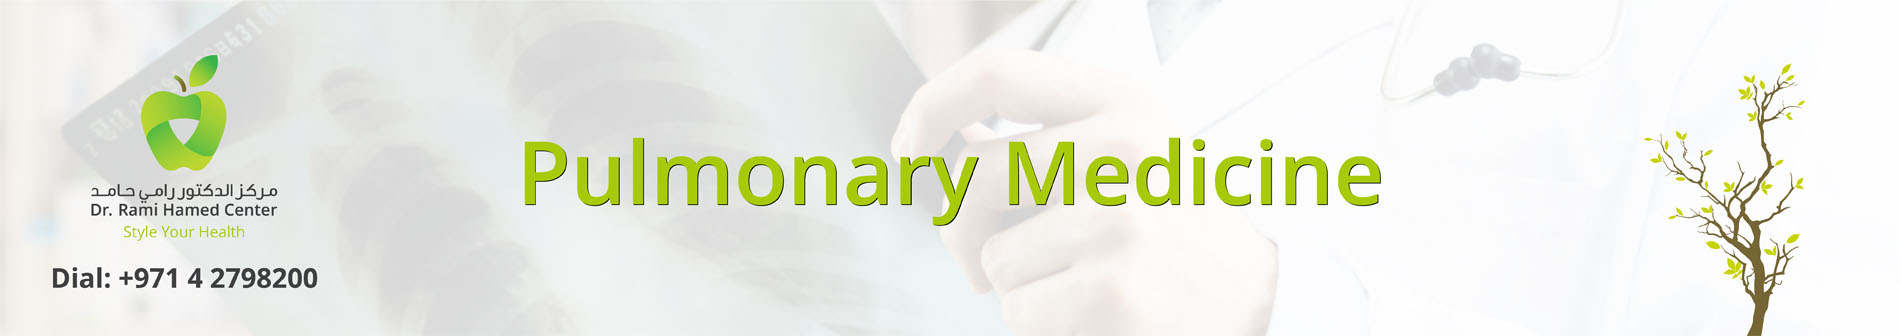 Pulmonary-2.jpg